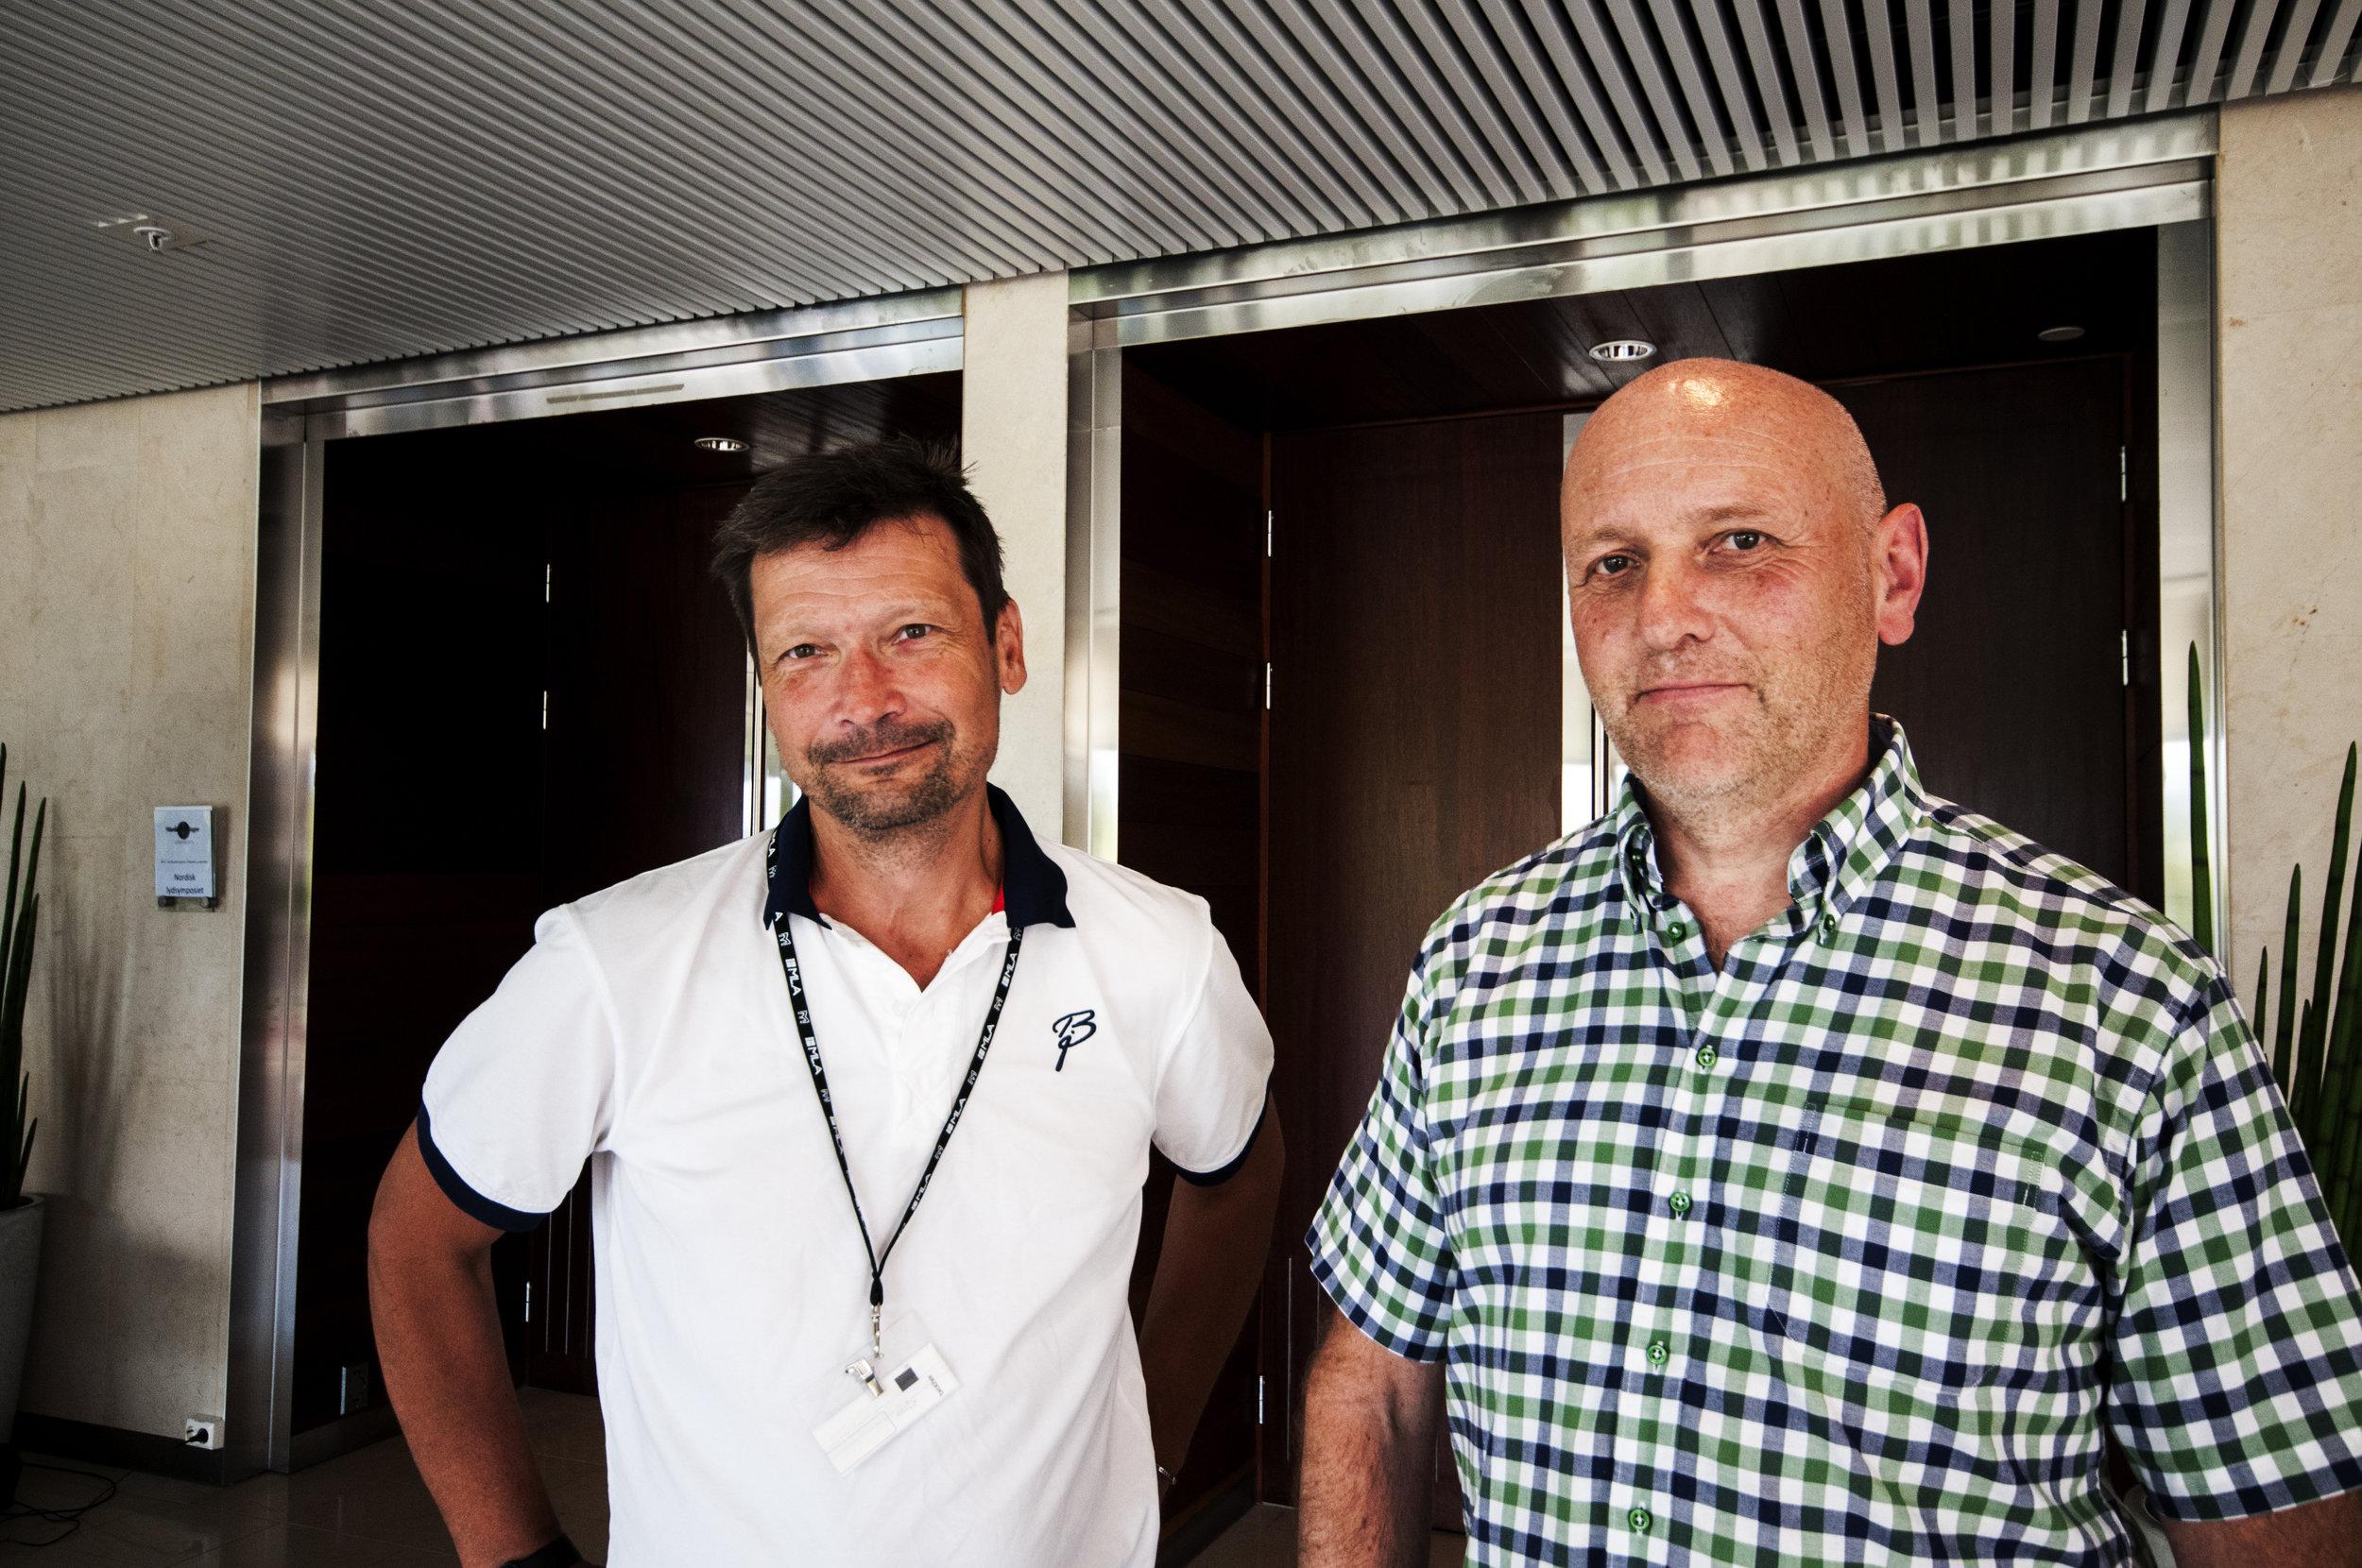 Morten Jutkvam er leder for NSS, mens Tor Vidar Fosse sitter i arrangementskomitéen. de er svært fornøyd med årets utgave.